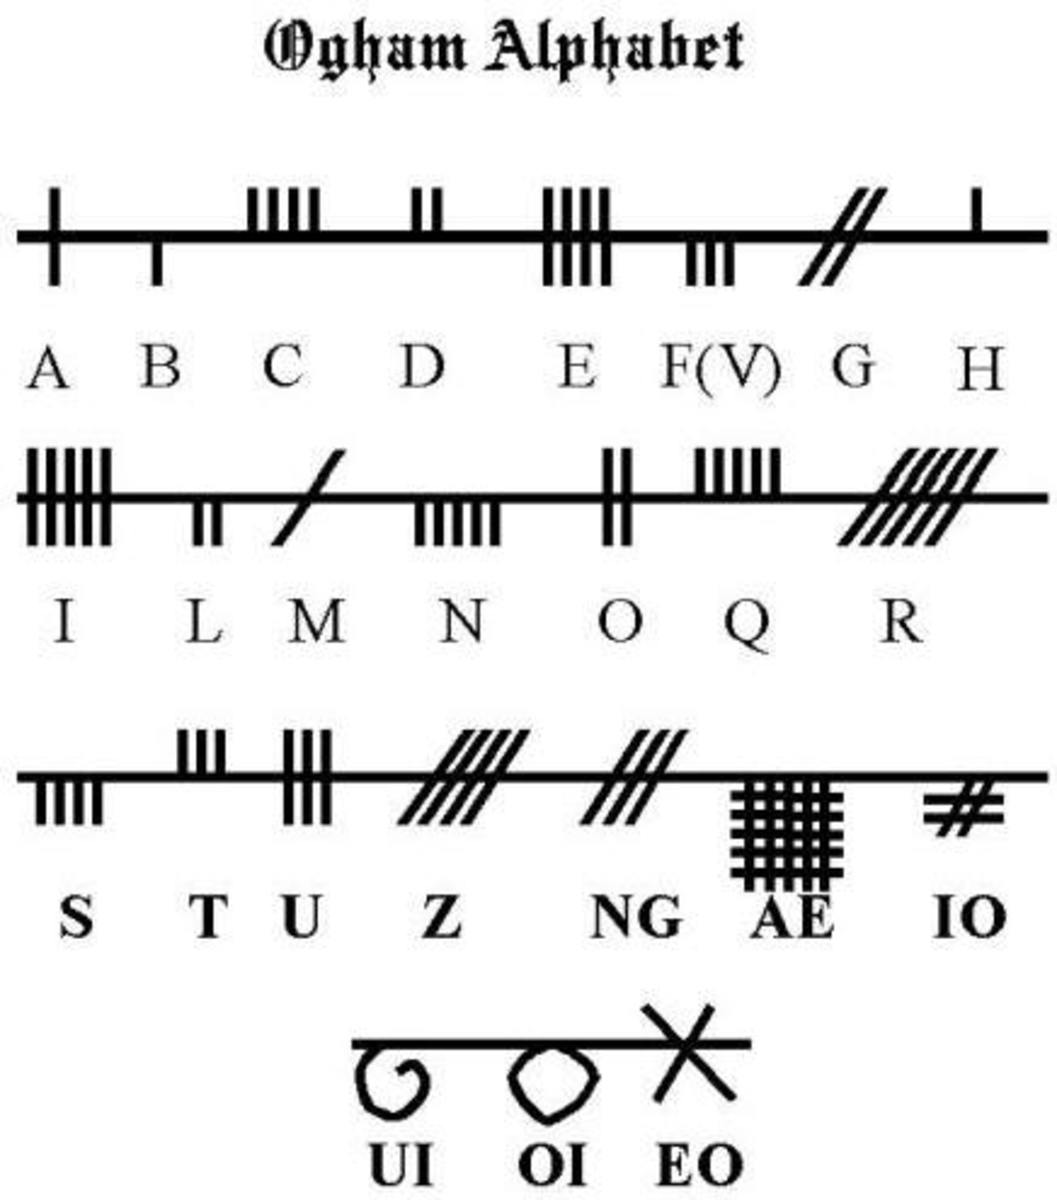 Ogham alphabet of twenty standard letters from Primitive Irish period.